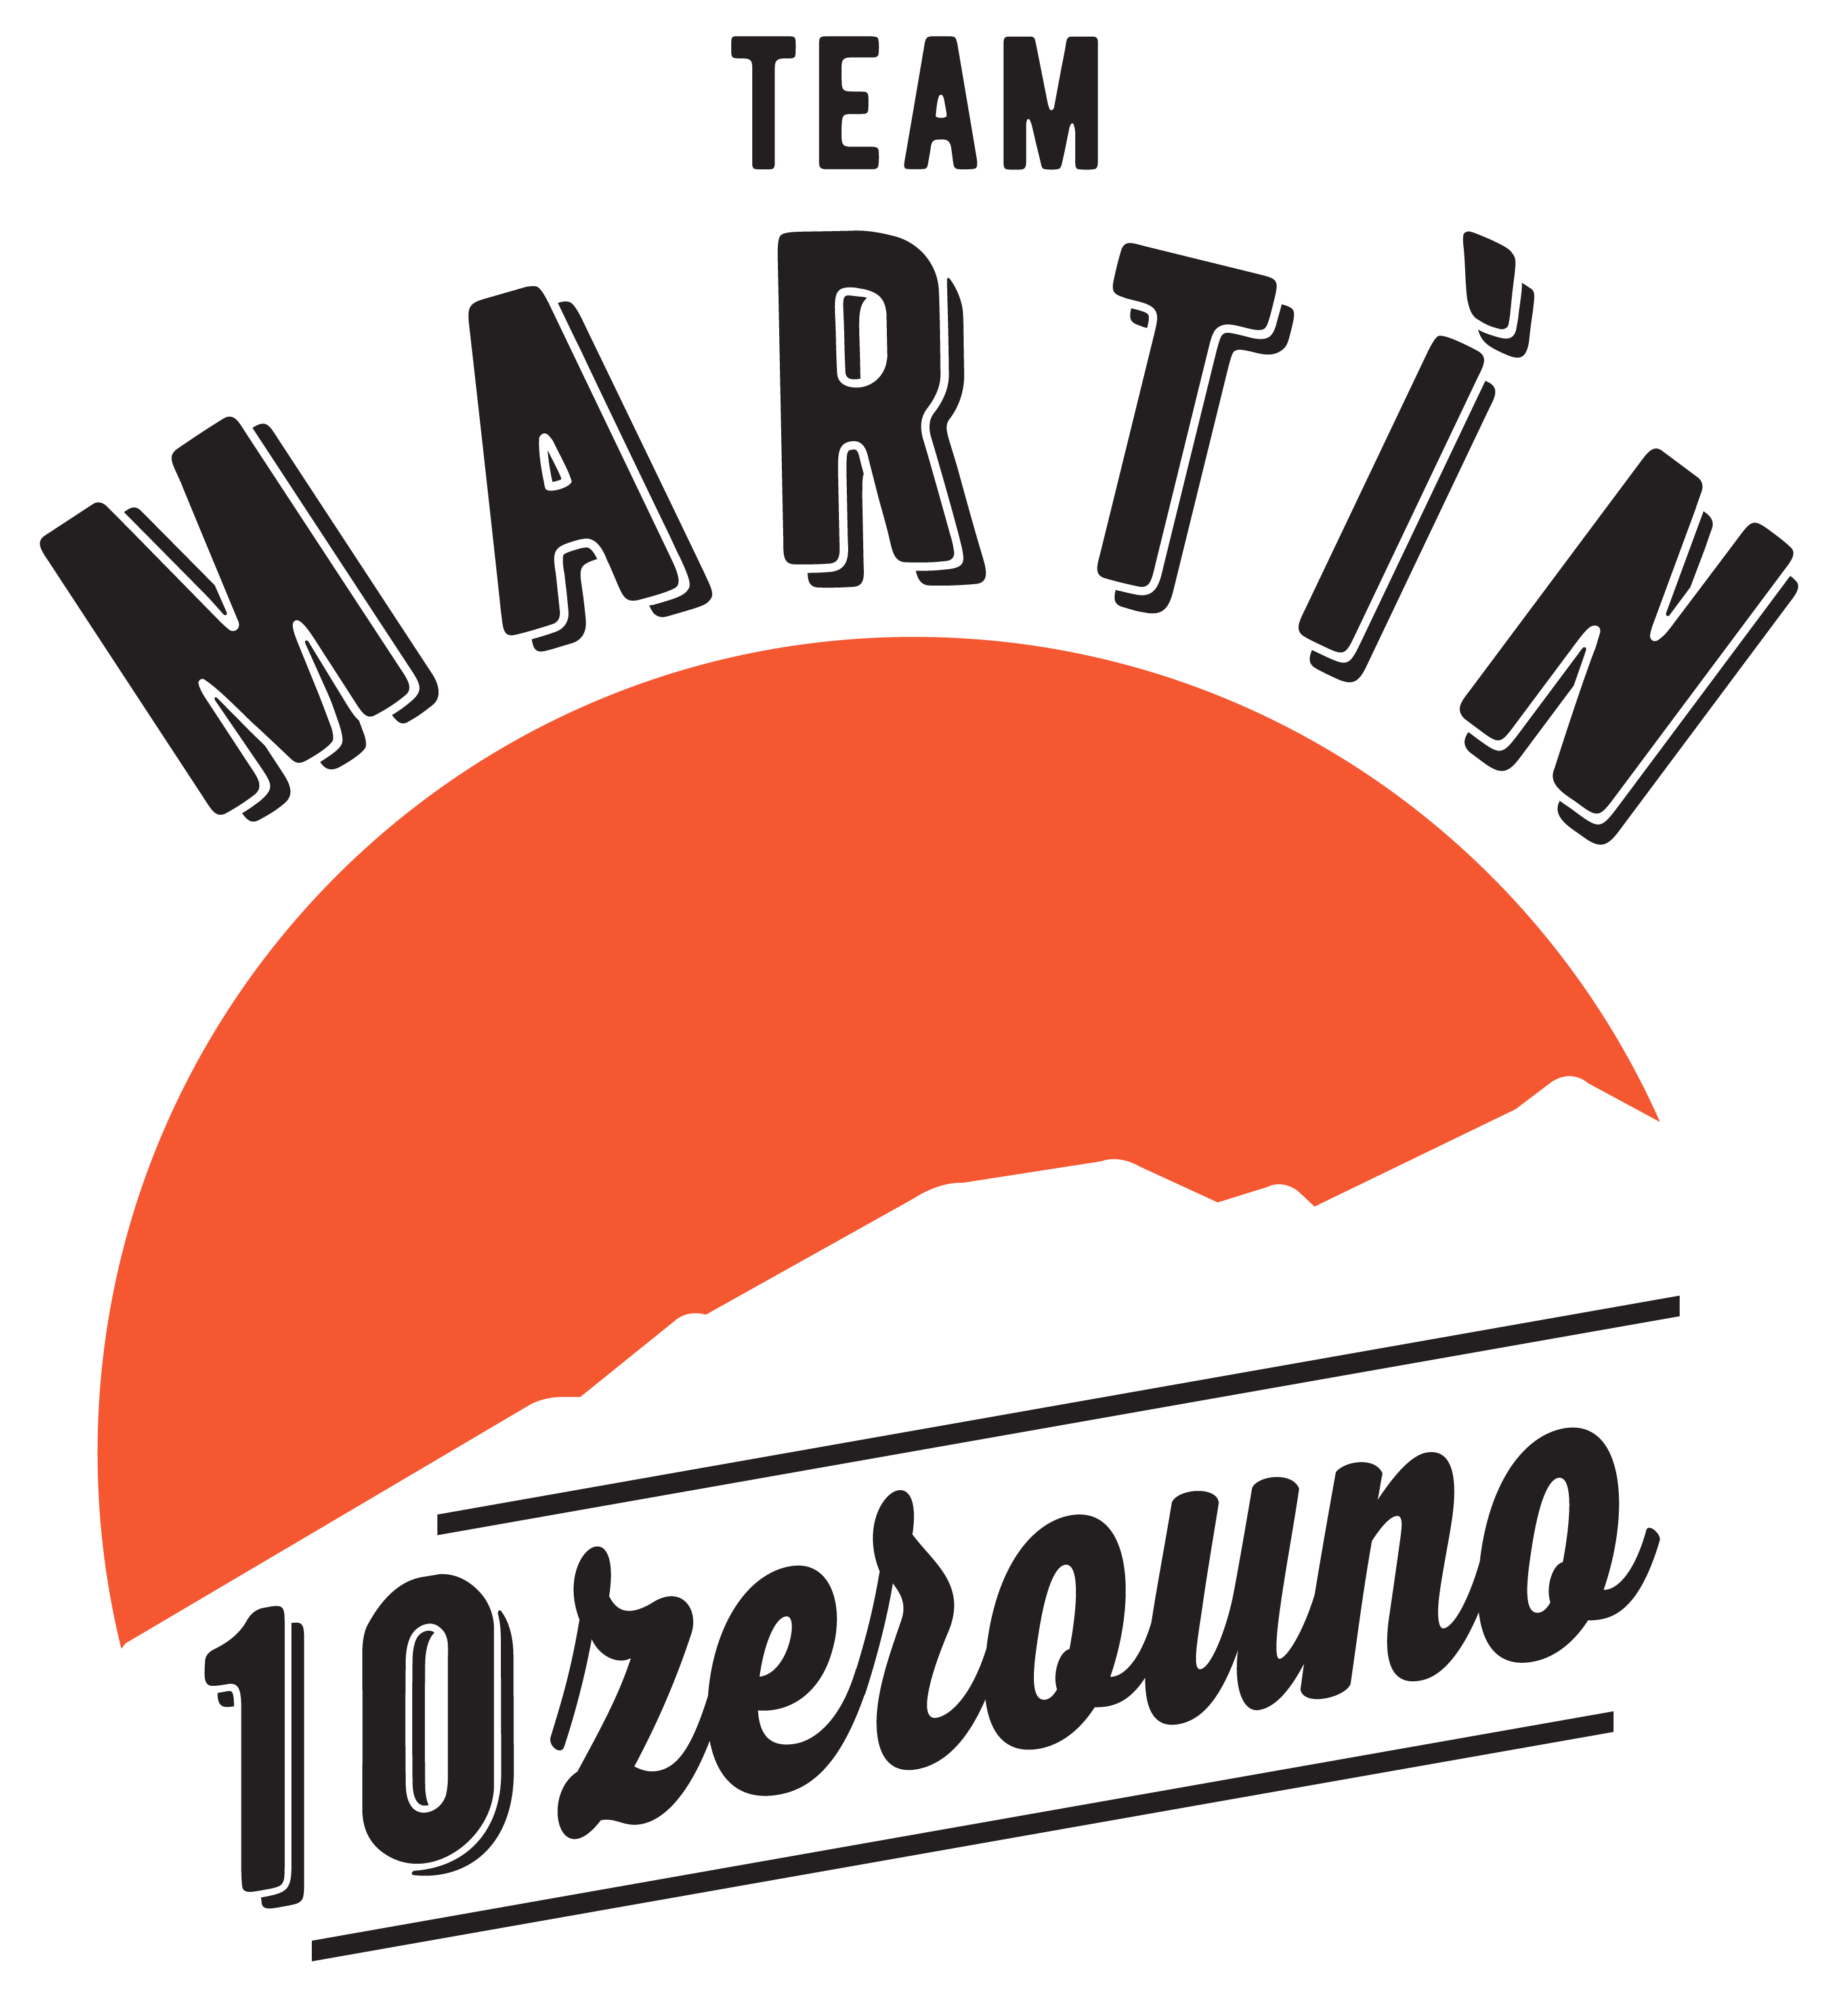 Team Martìn 10zerouno – Punta Martìn Races